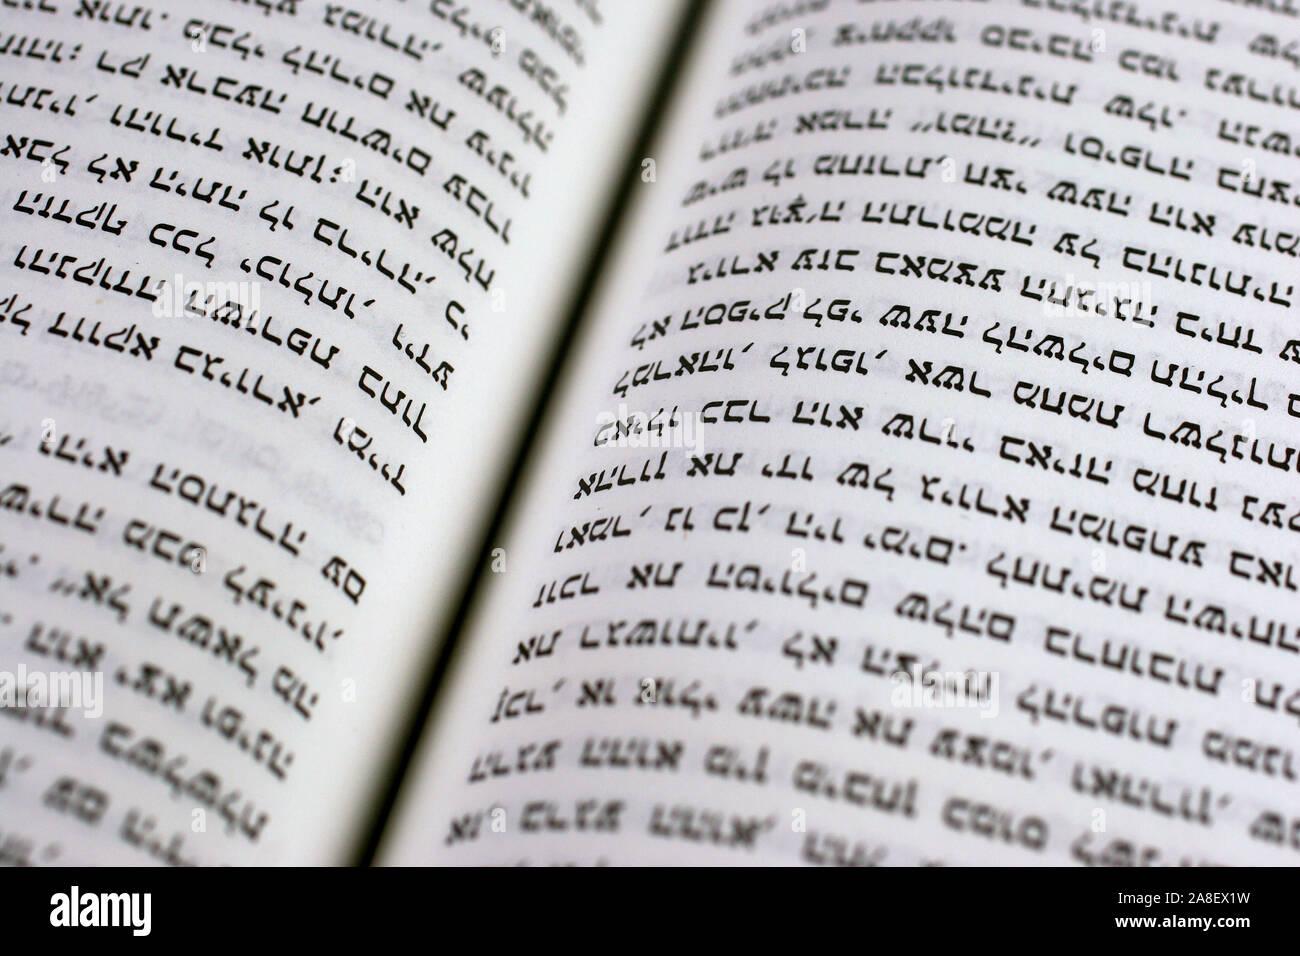 Buch in hebräischer Schrift, Stock Photo